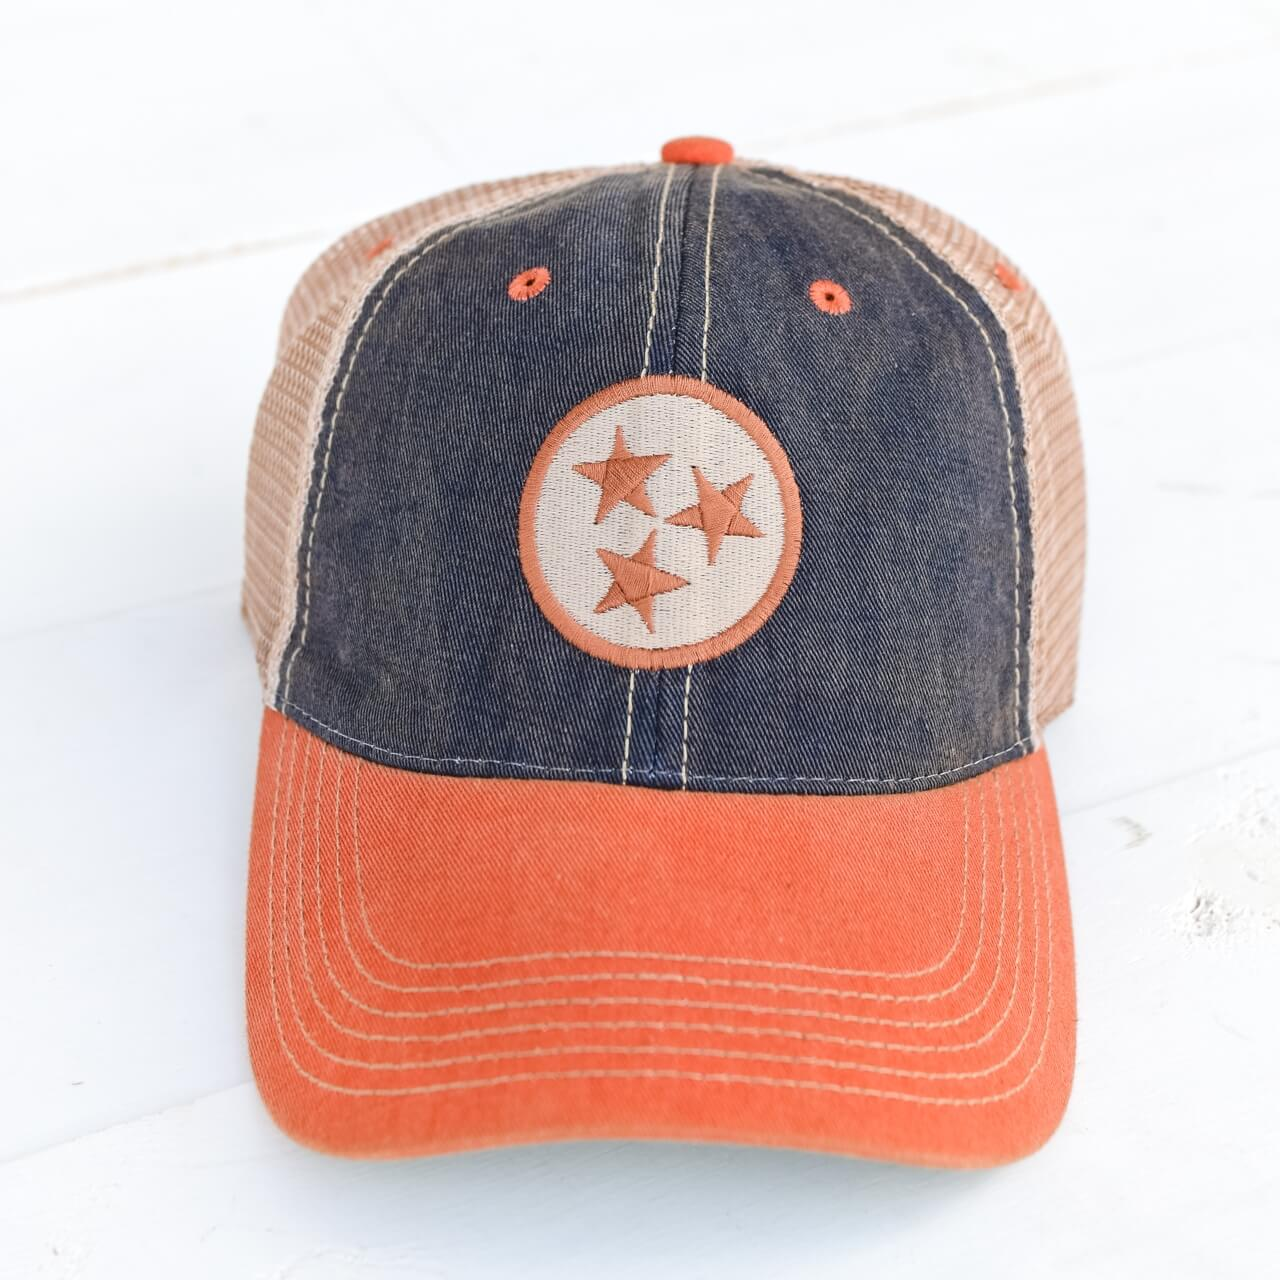 db11a4b6efc Tri-Star Trucker Hat